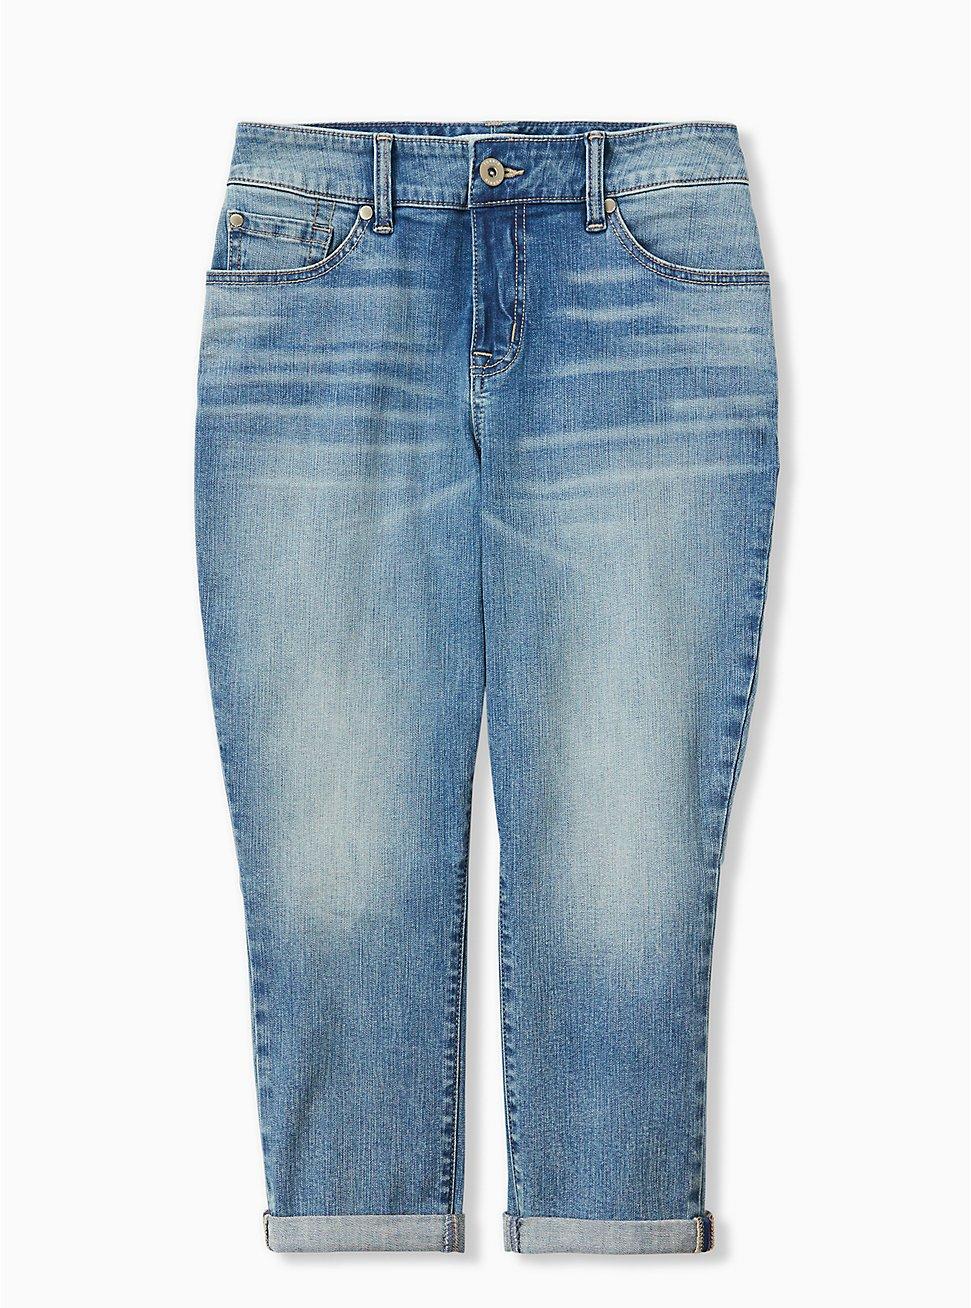 Crop Mid Rise Skinny Jean - Vintage Stretch Light Wash, CRUISE CONTROL, hi-res